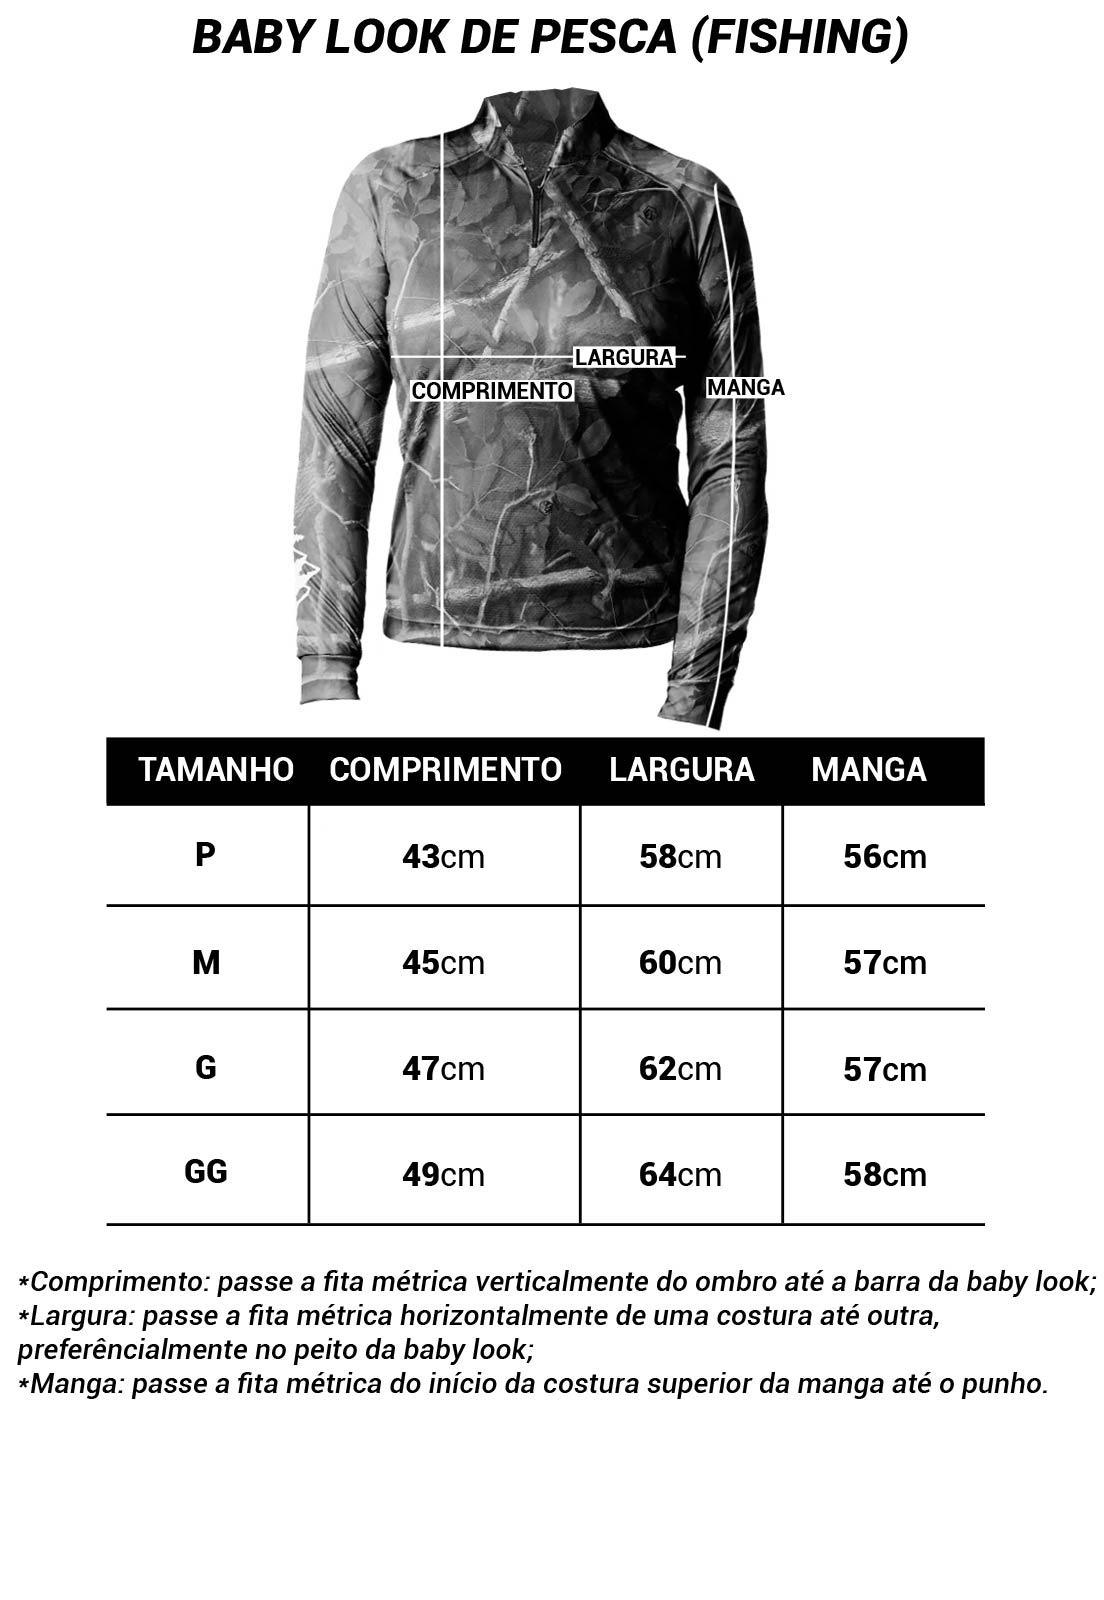 CAMISA DE PESCA FISH PINTADO 02 FEMININA + BANDANA GRÁTIS  - REAL HUNTER OUTDOORS